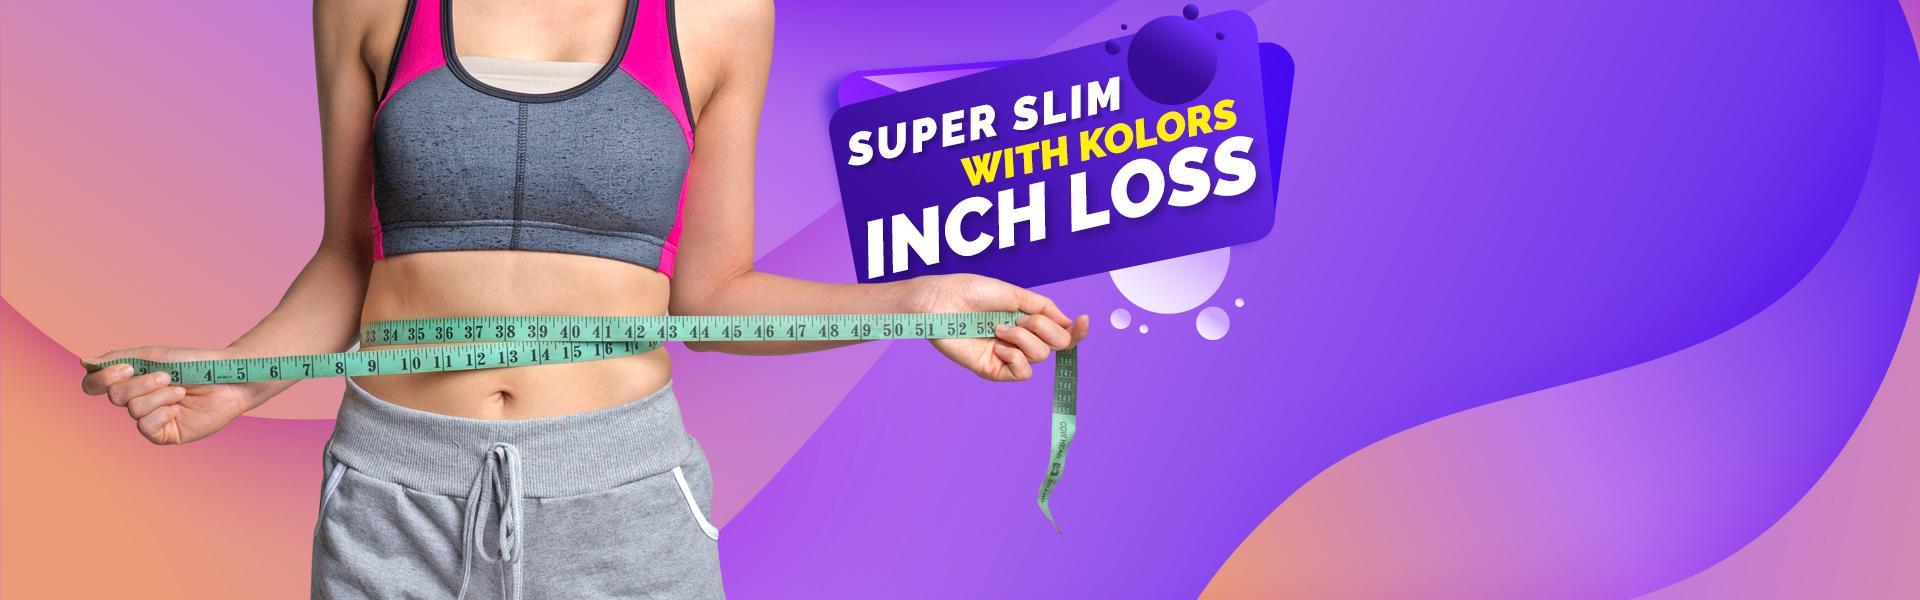 Slimming Amp Weight Loss Center Skin Amp Hair Clinic Kolors